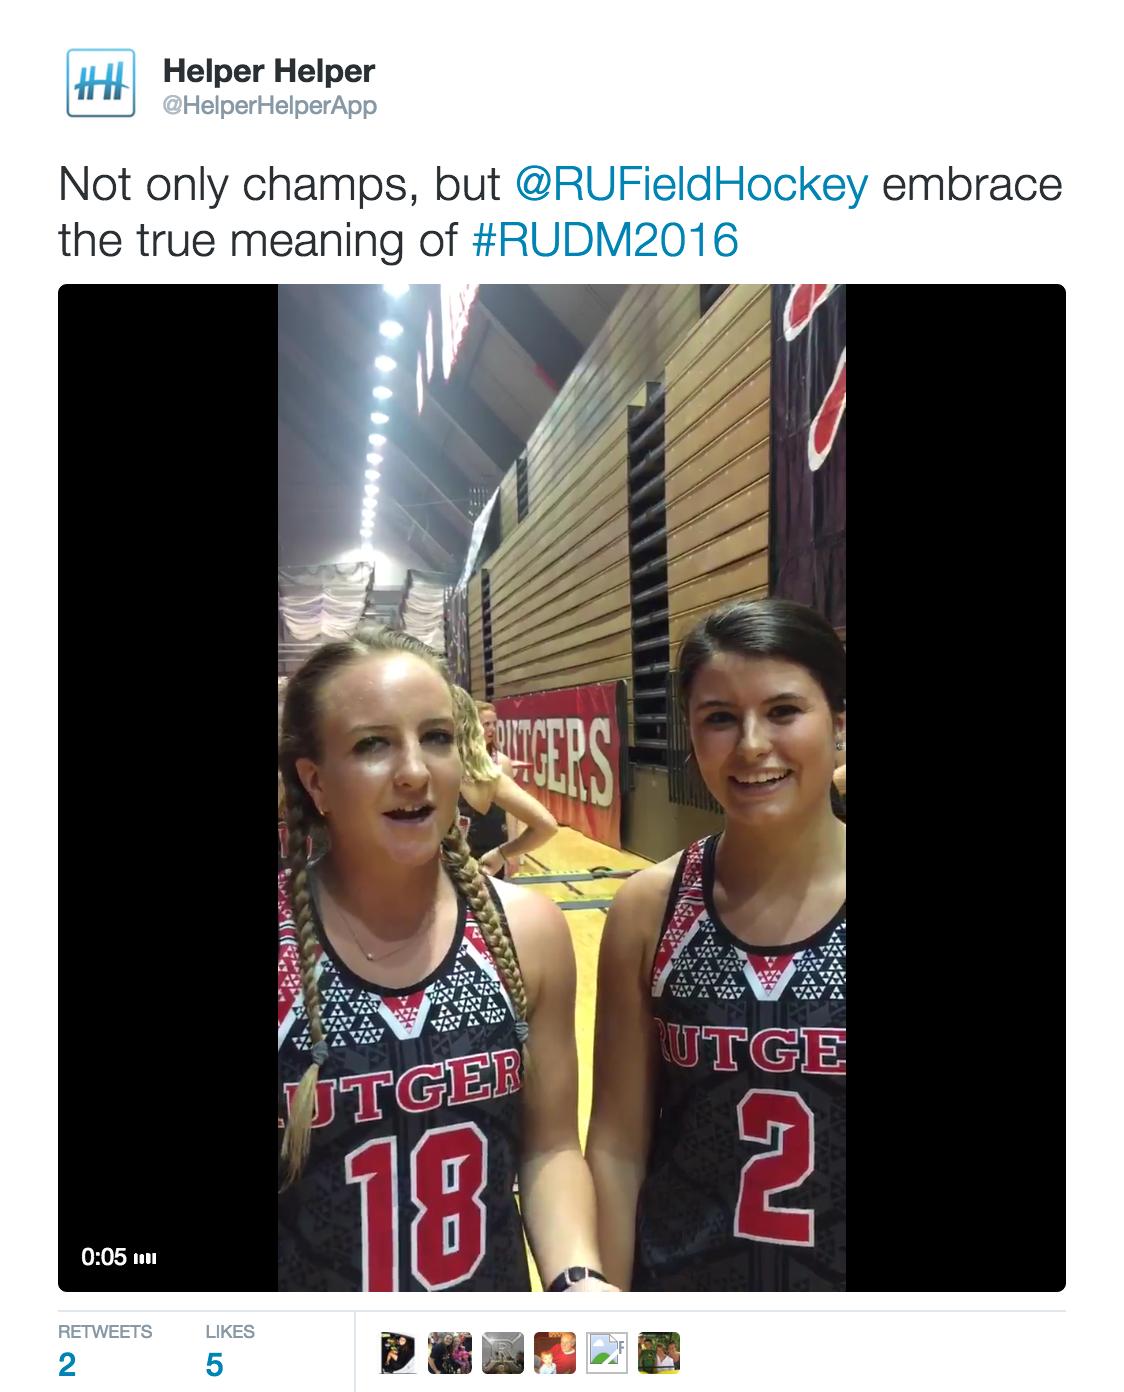 Rutgers Athletics Community Service